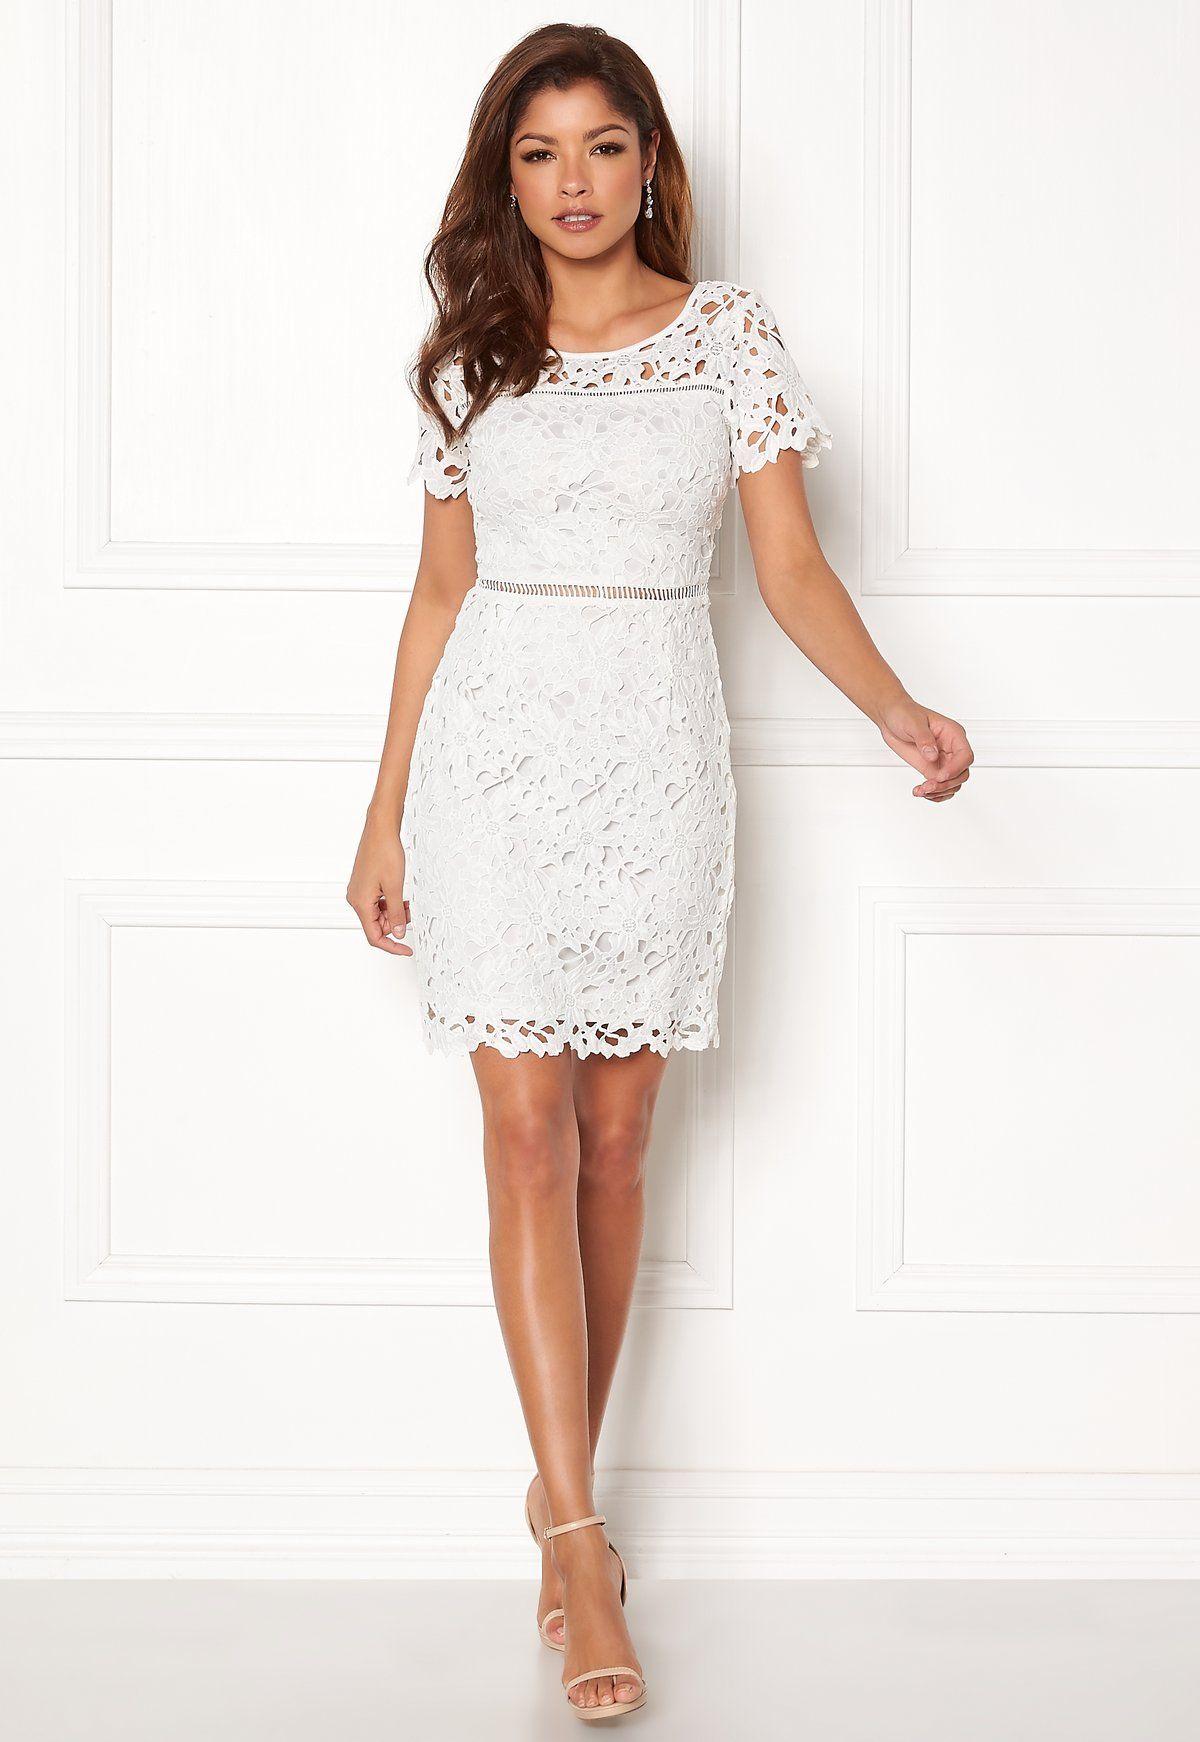 7ee5f453521b Chiara Forthi Felizia Lace Dress Cream - Bubbleroom | Vackra ...